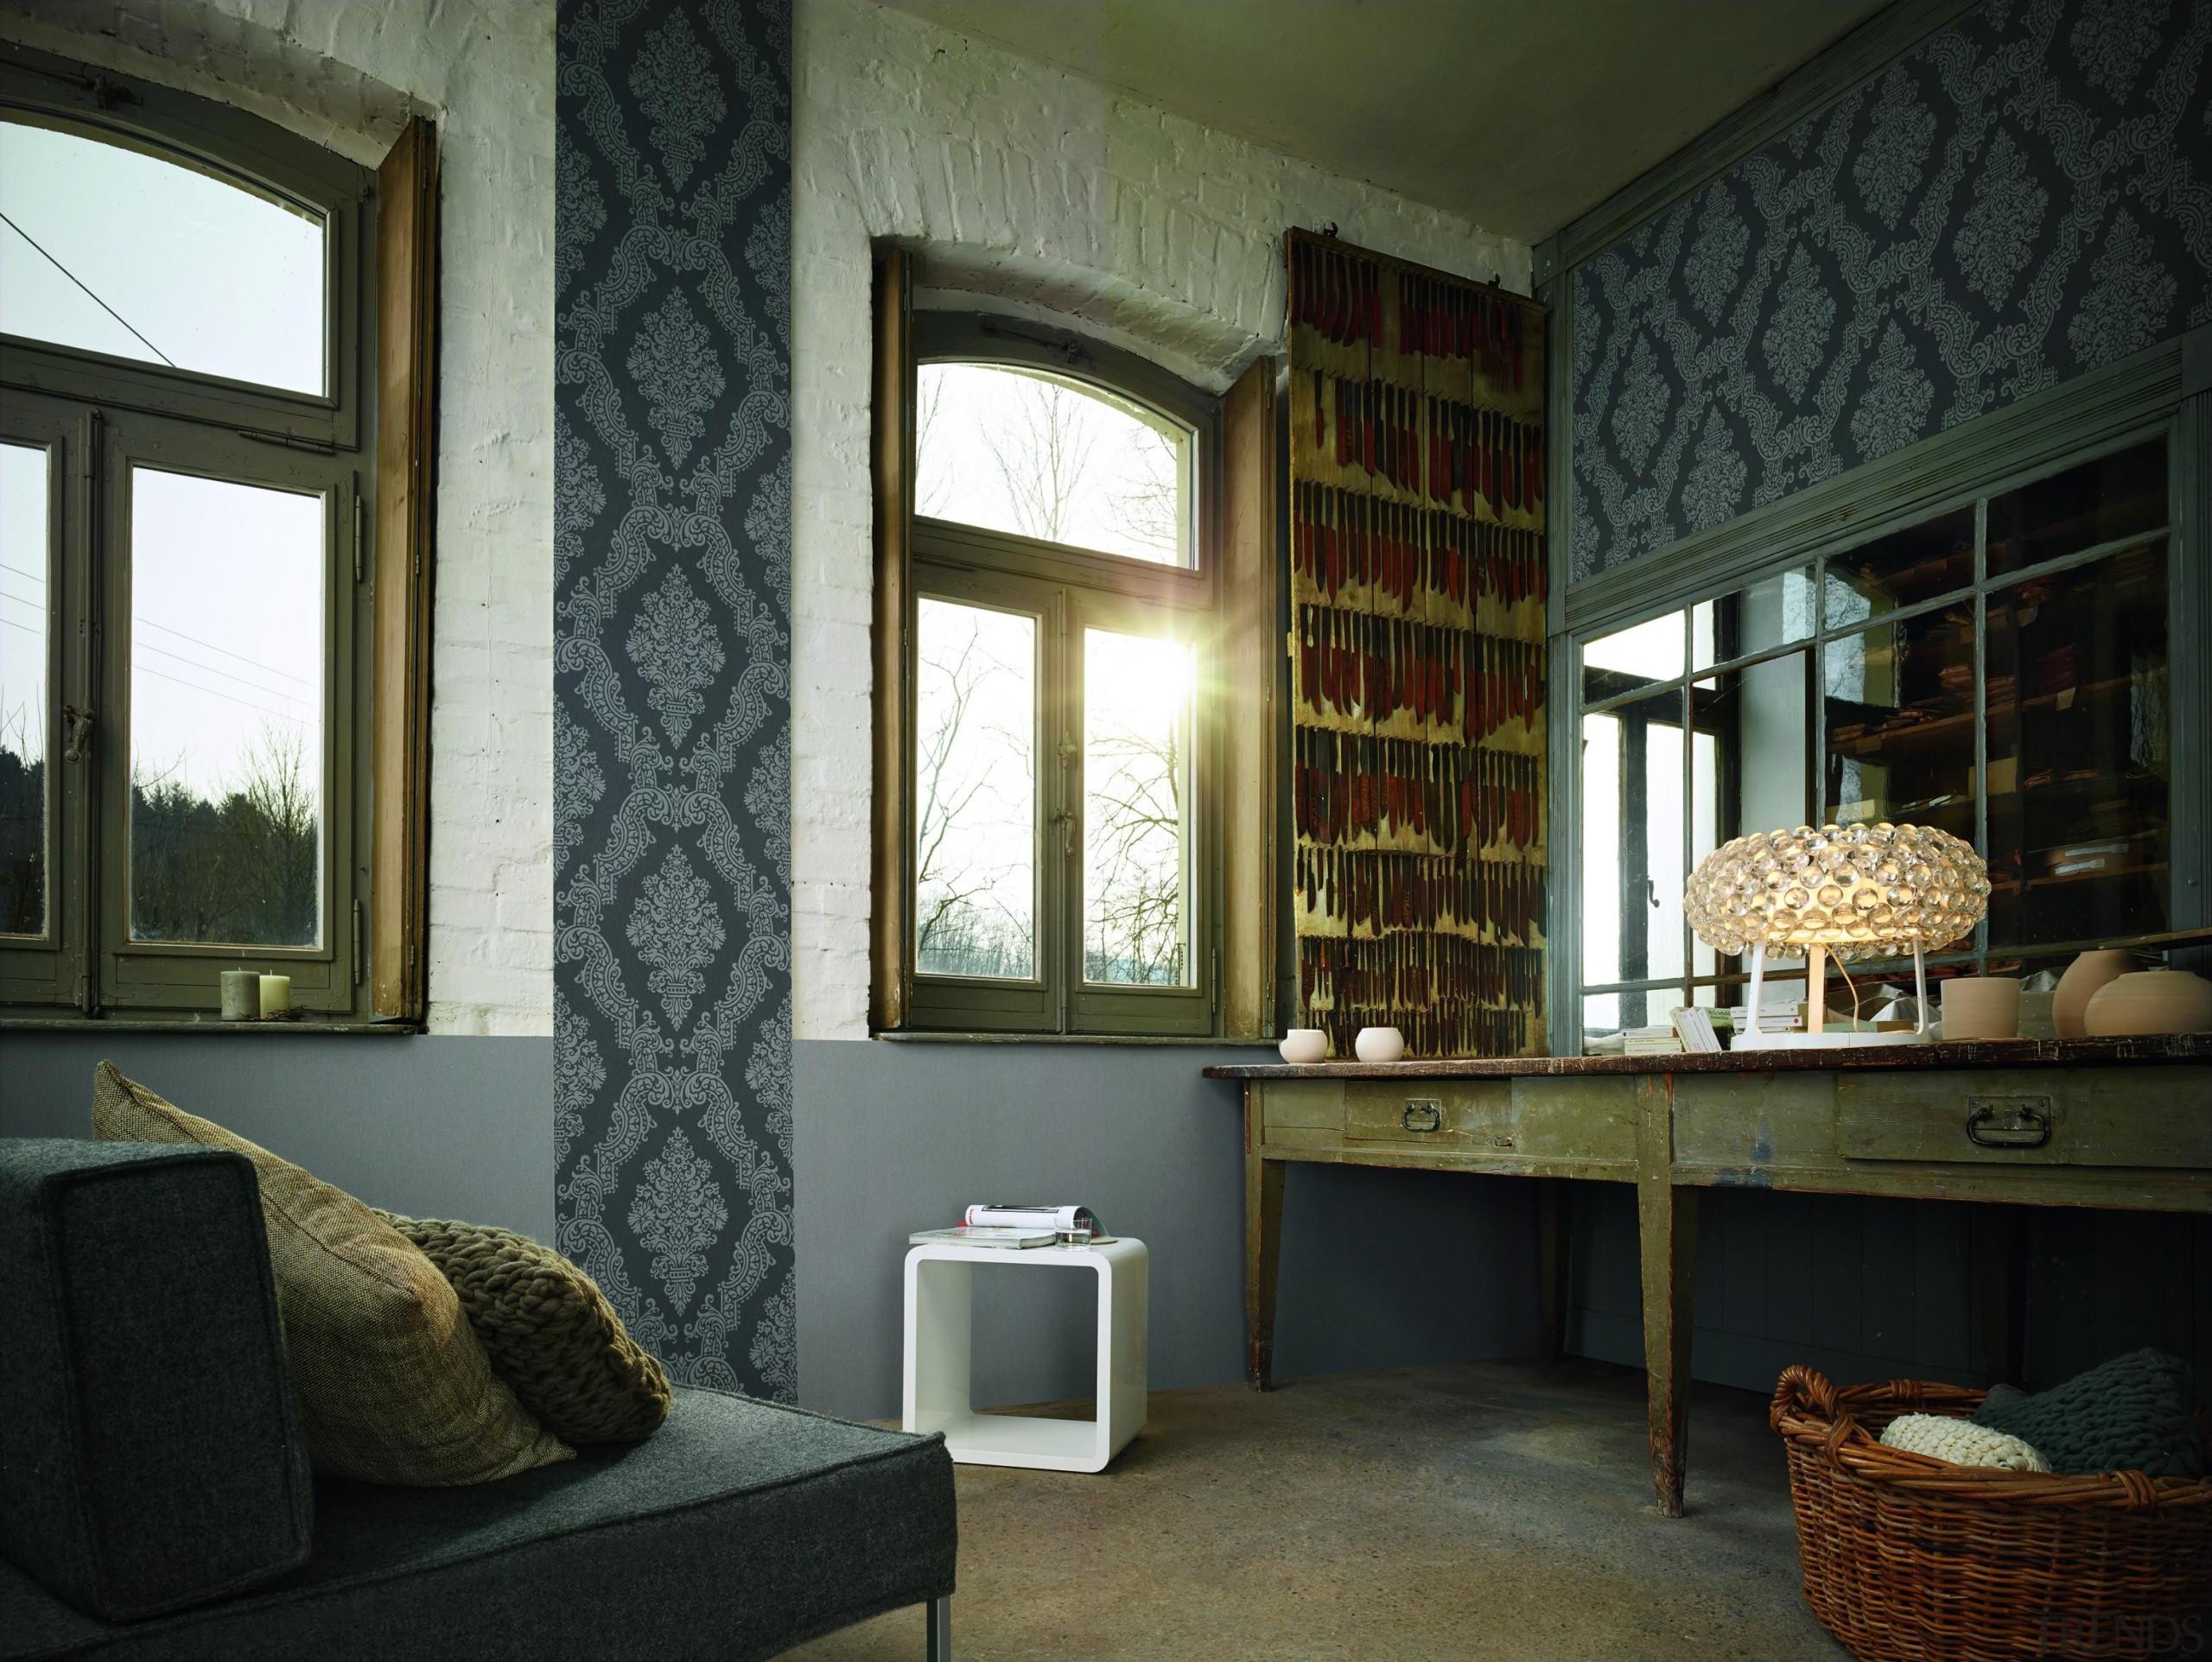 Elegance II Range - Elegance II Range - ceiling, estate, home, interior design, living room, real estate, room, wall, window, window treatment, black, brown